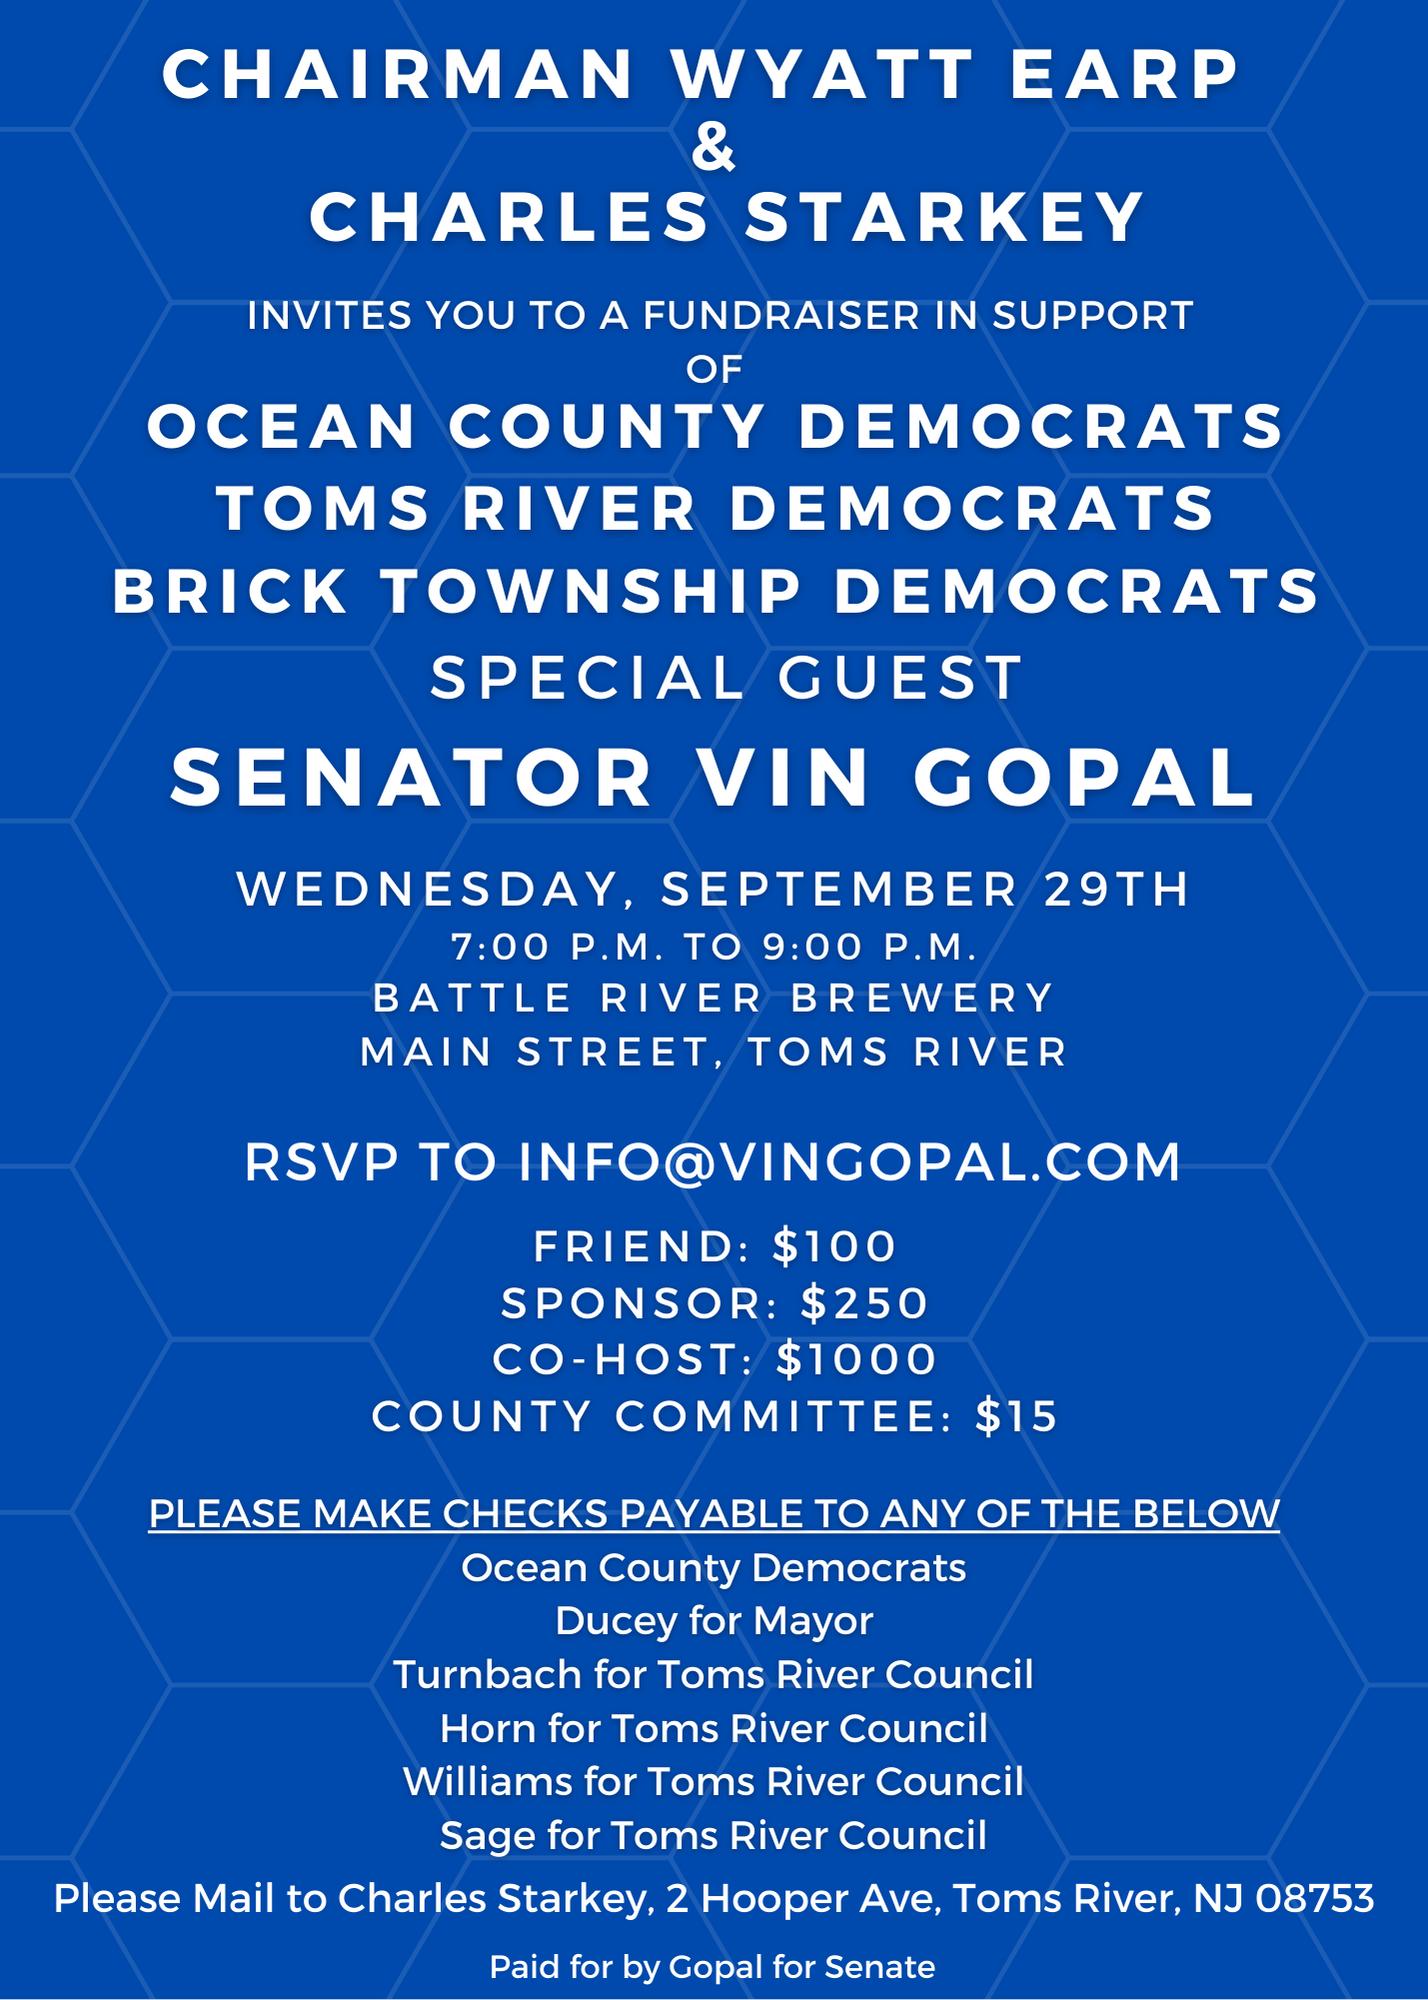 Ocean County Democrats Fundraiser with Vin Gopal